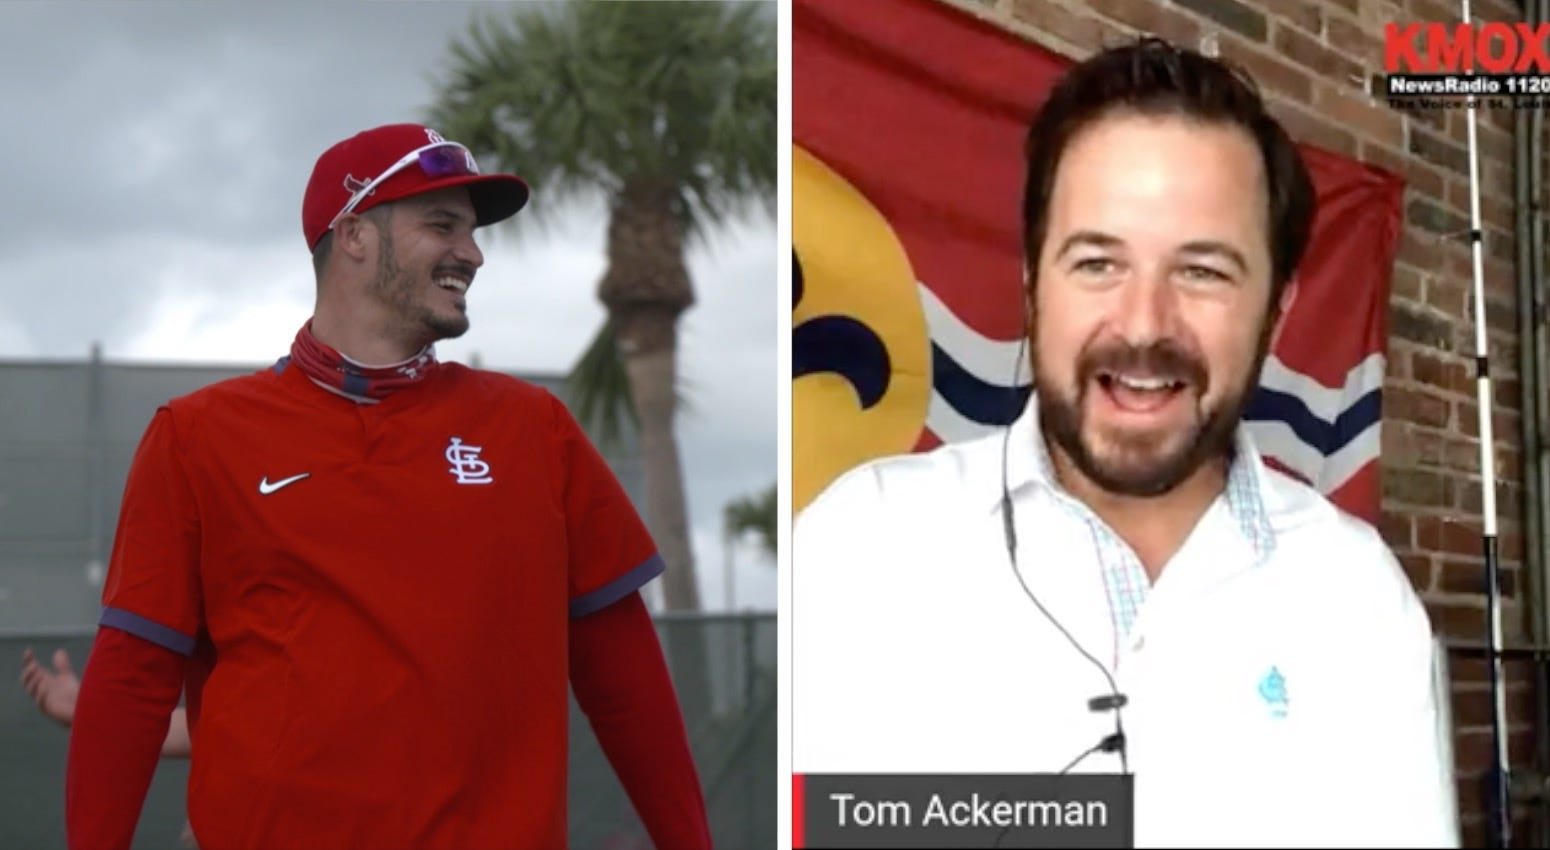 WATCH LIVE: Cardinals 3B Nolan Arenado joins the Garage Happy Hour with Tom Ackerman